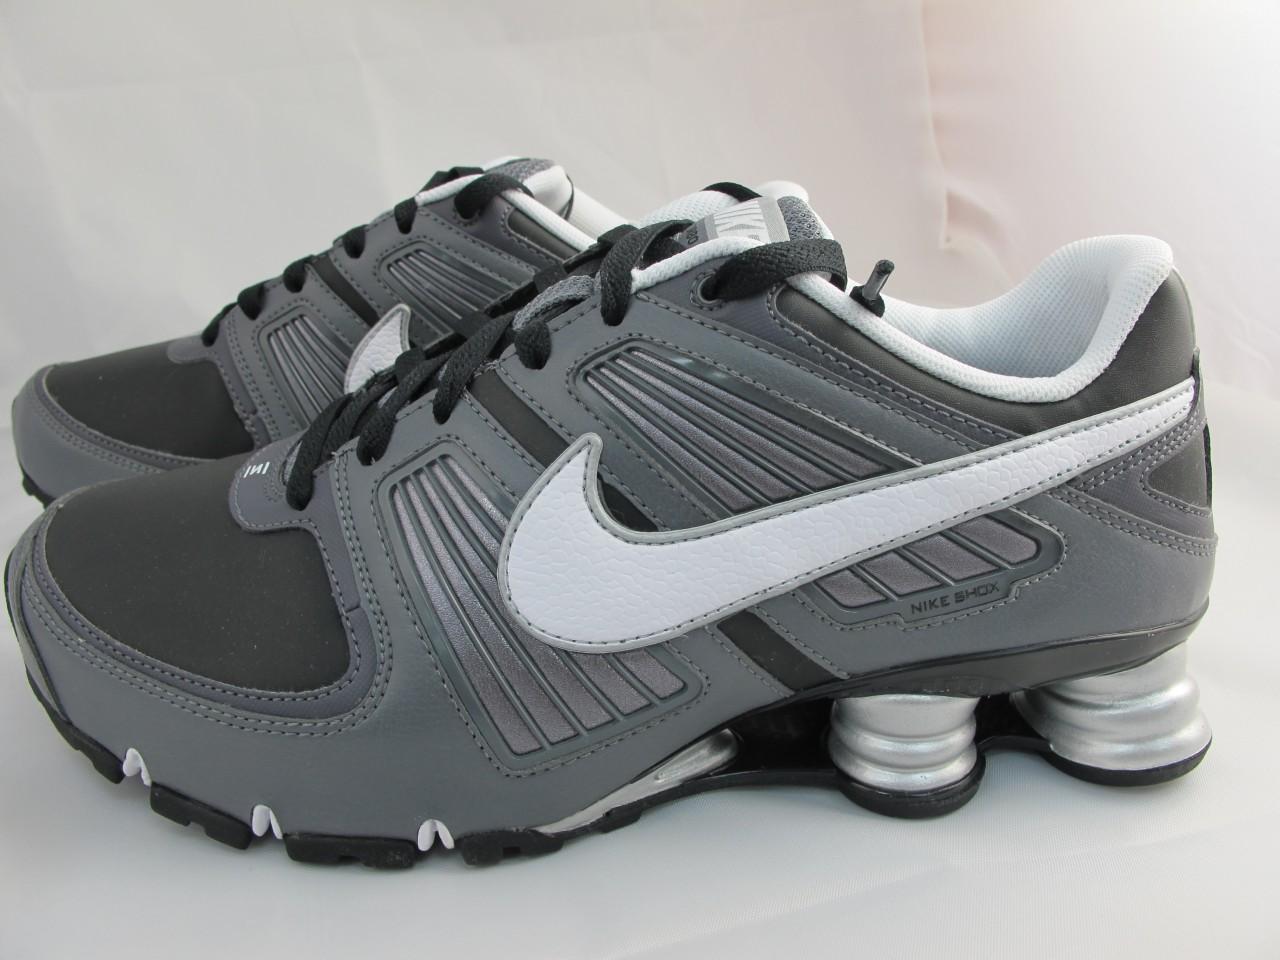 8f0b16adfe2718 Nike Shox Turbo Plus 9